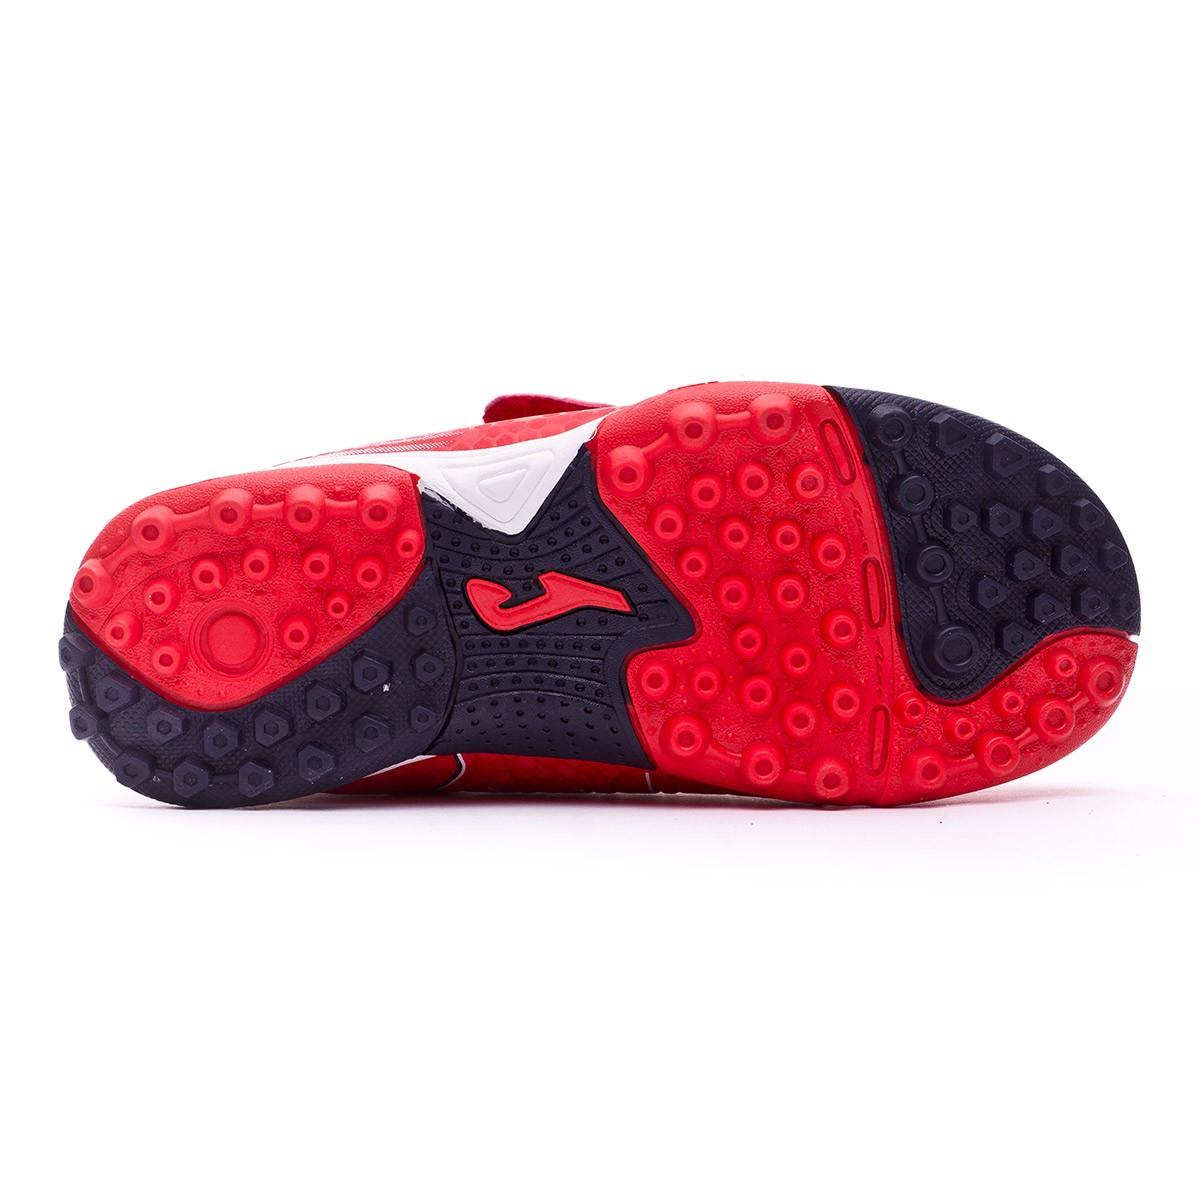 Zapatilla Joma Tactil Turf Velcro Niño Red-White - Soloporteros es ... 4017db9a67444